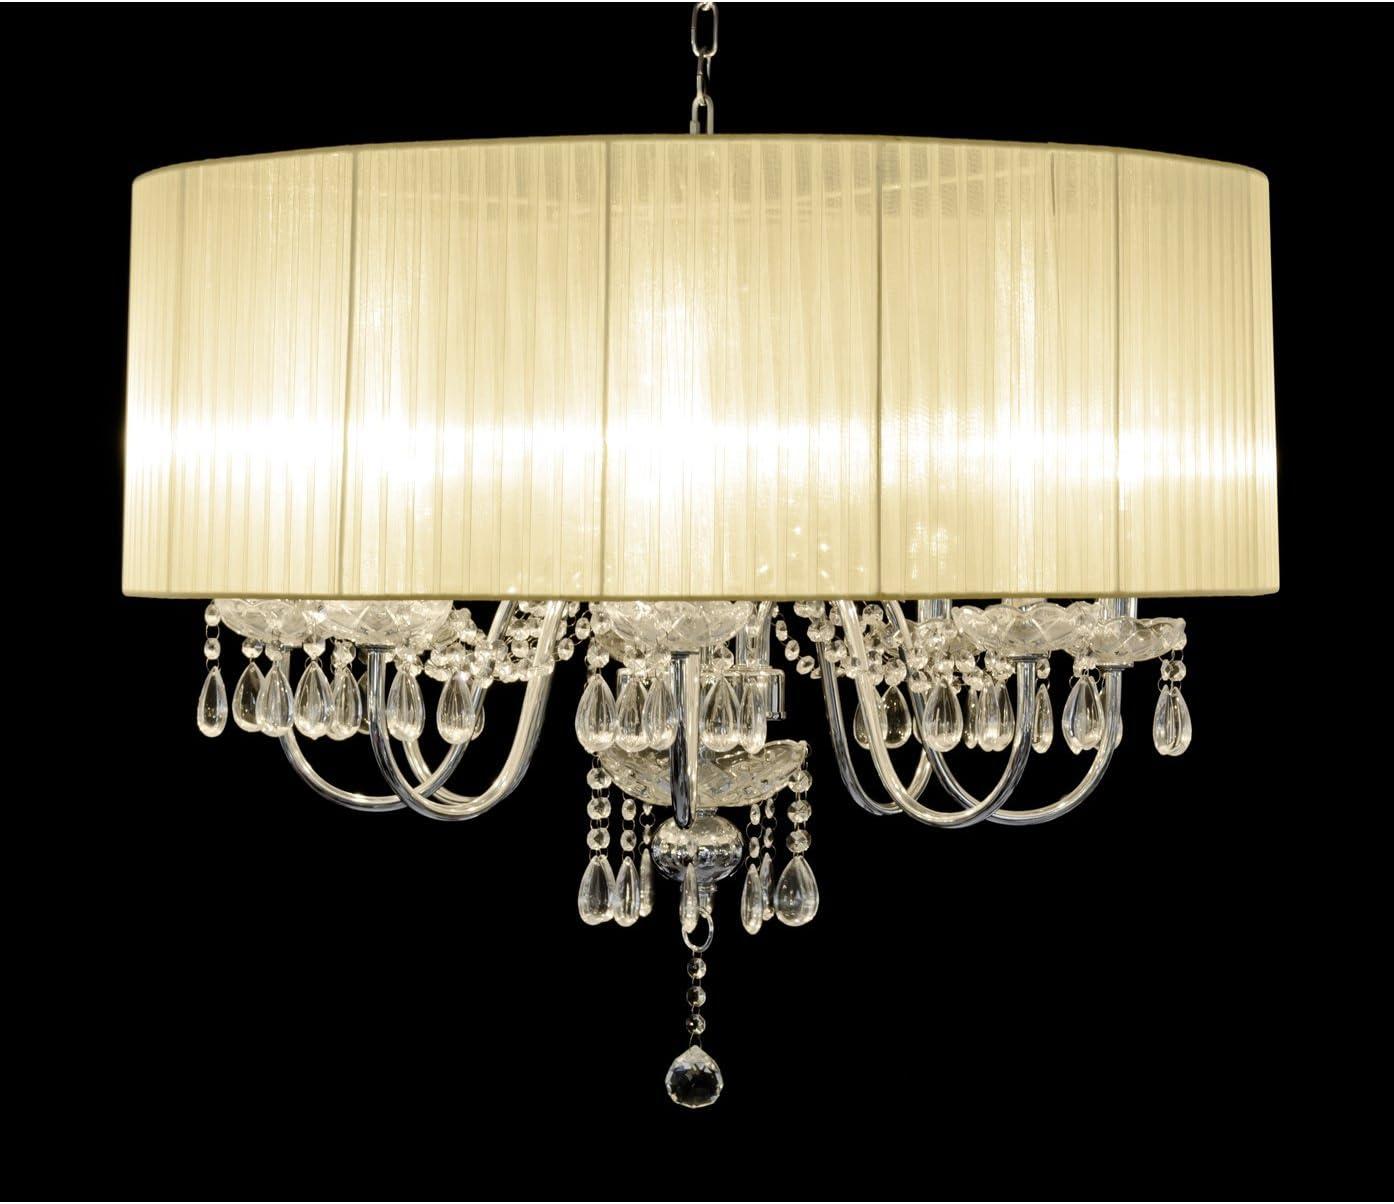 Beaumont 8 Light Chandelier, Glass, White: Amazon.co.uk